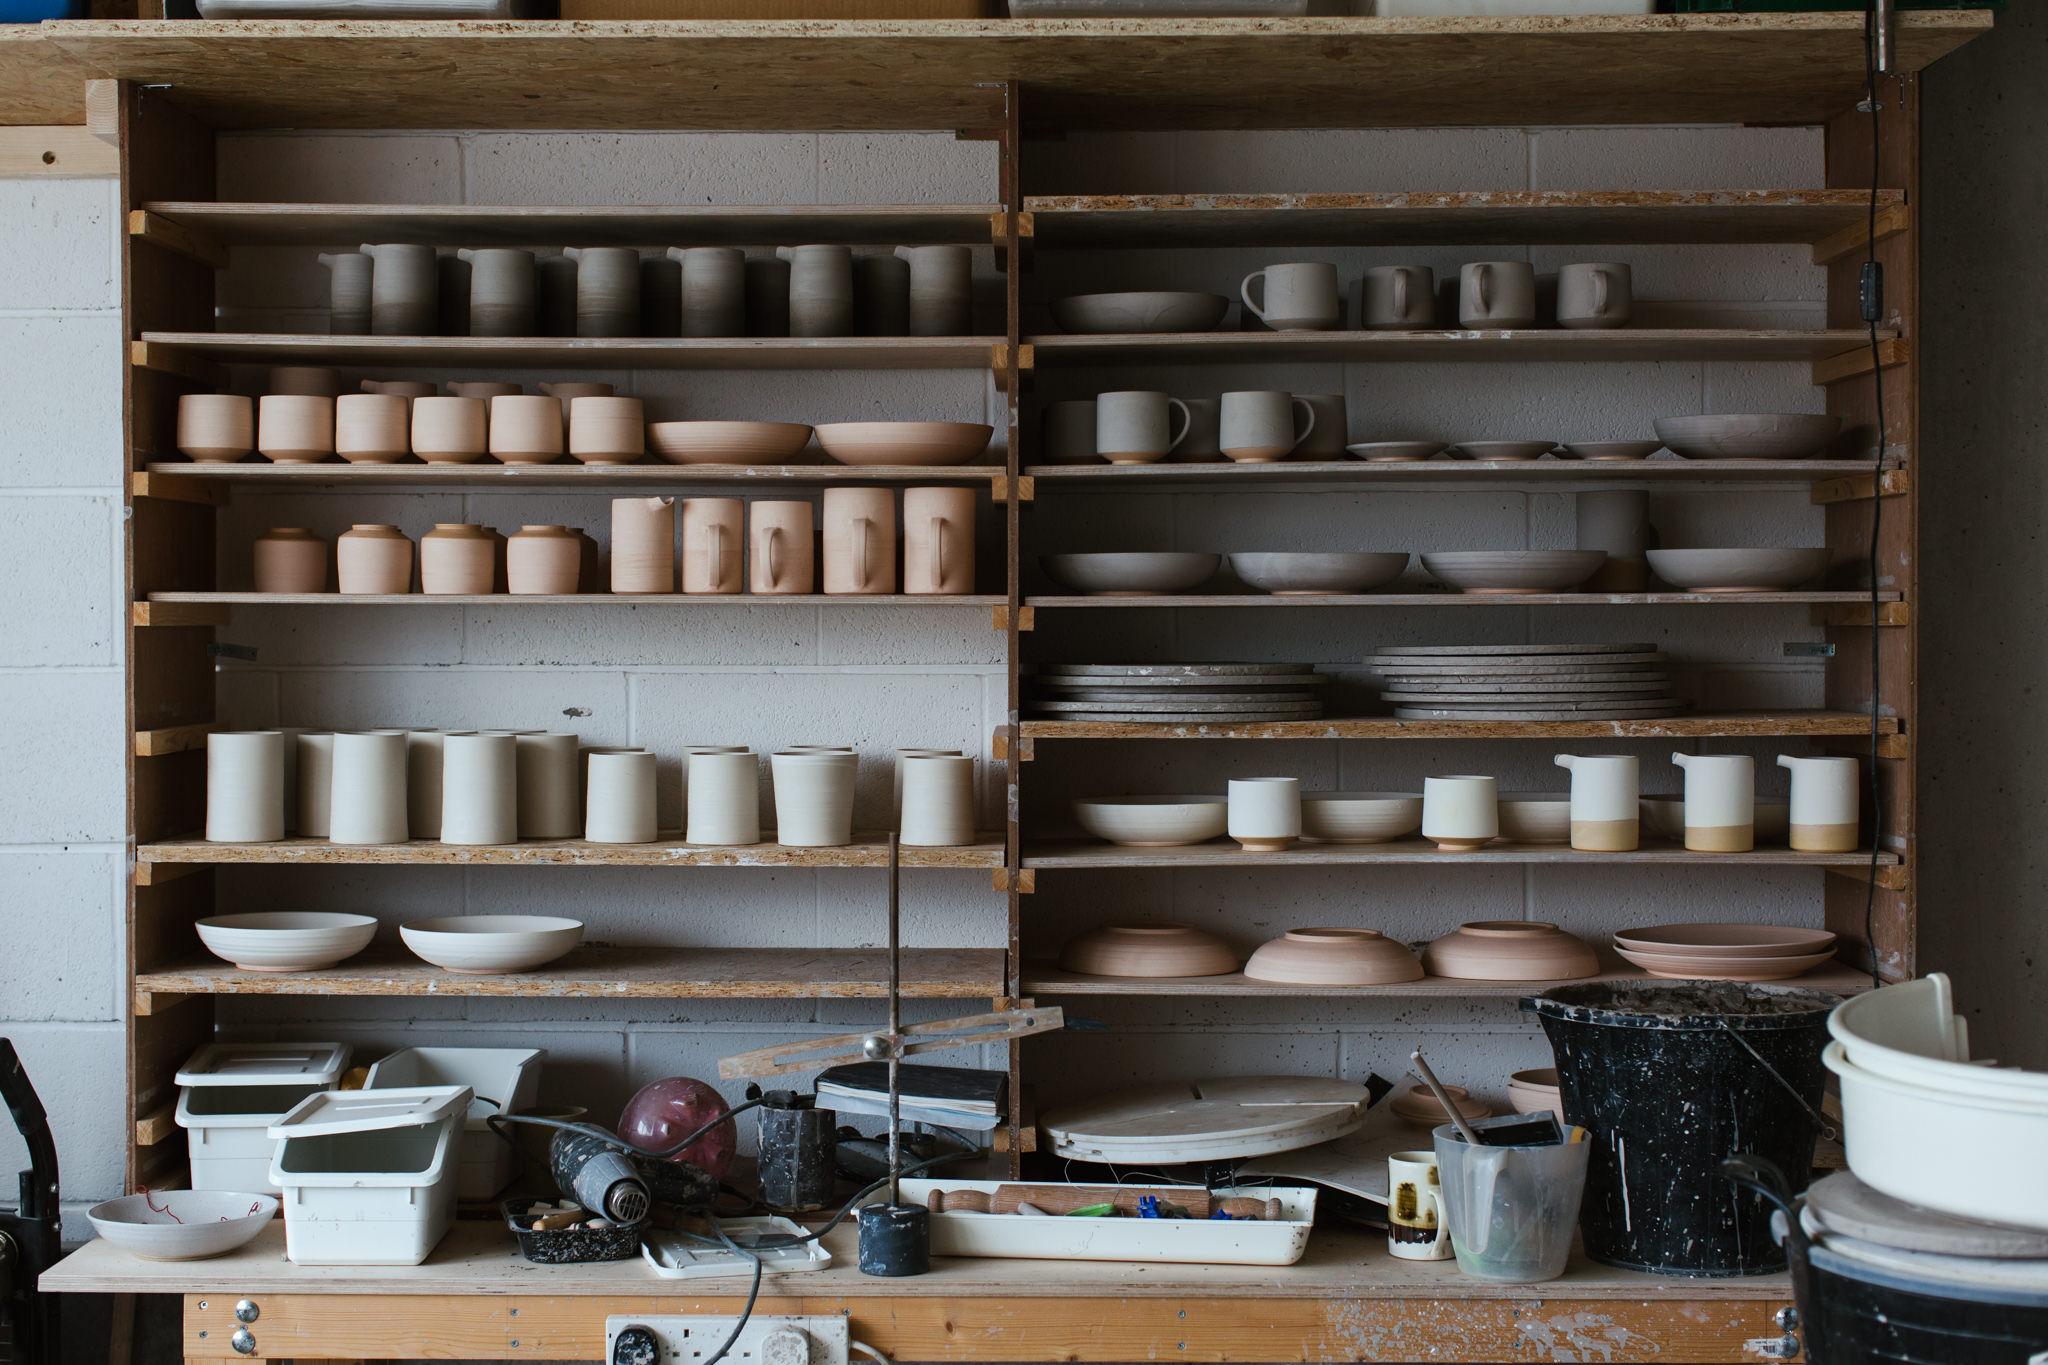 Pottery_West-5895.JPG